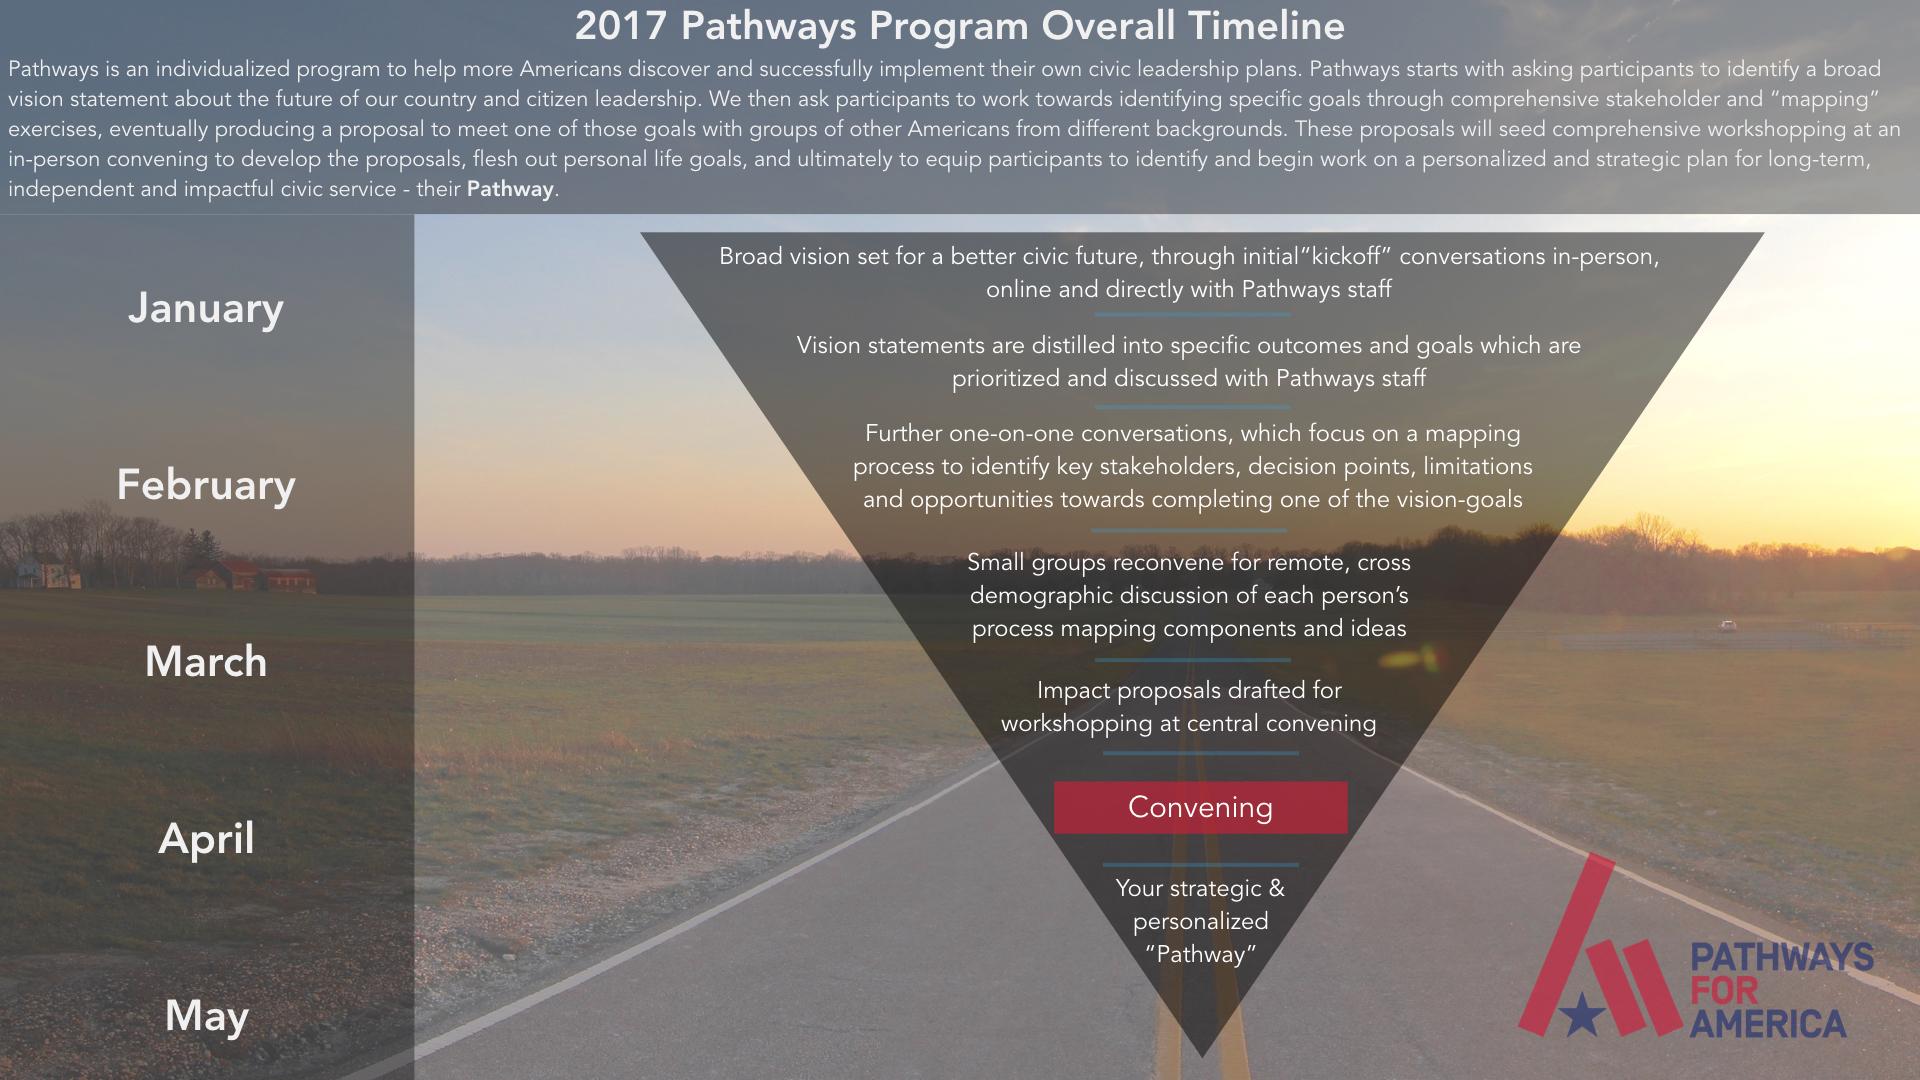 Pathways program timeline